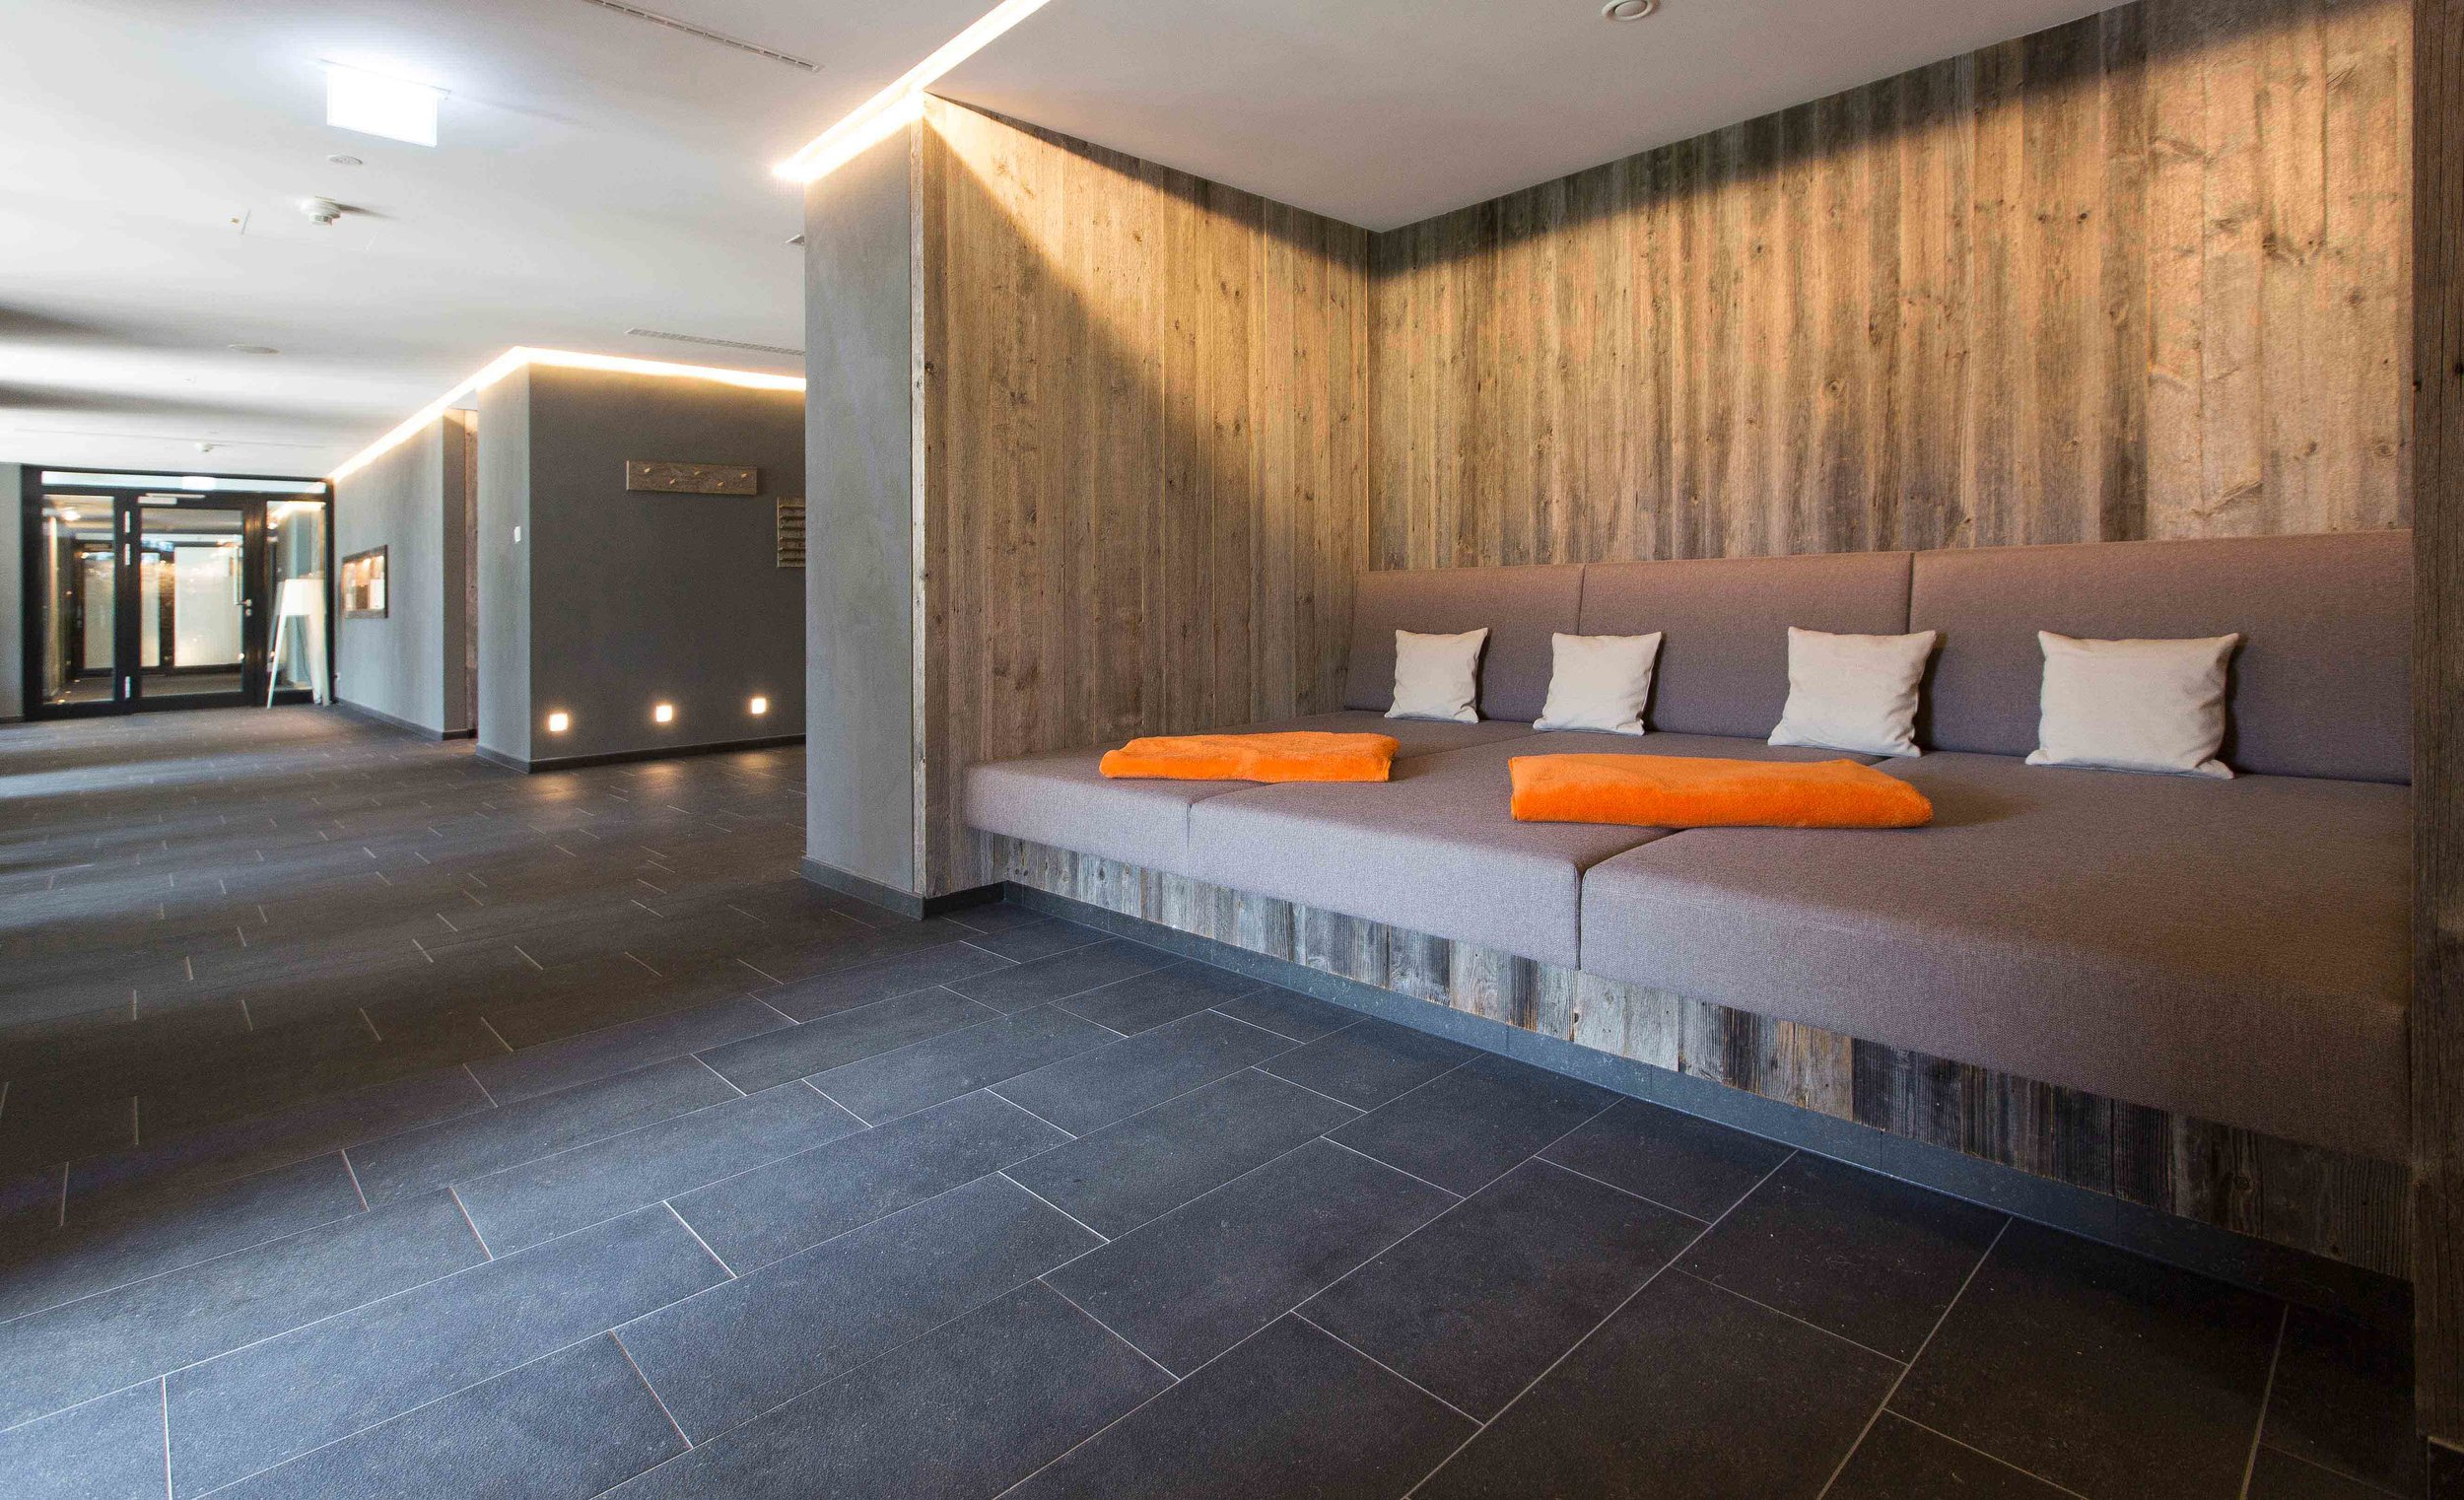 Hotel_Graseck_-_Altholz_sonnenverbrannt_grau_21.jpg